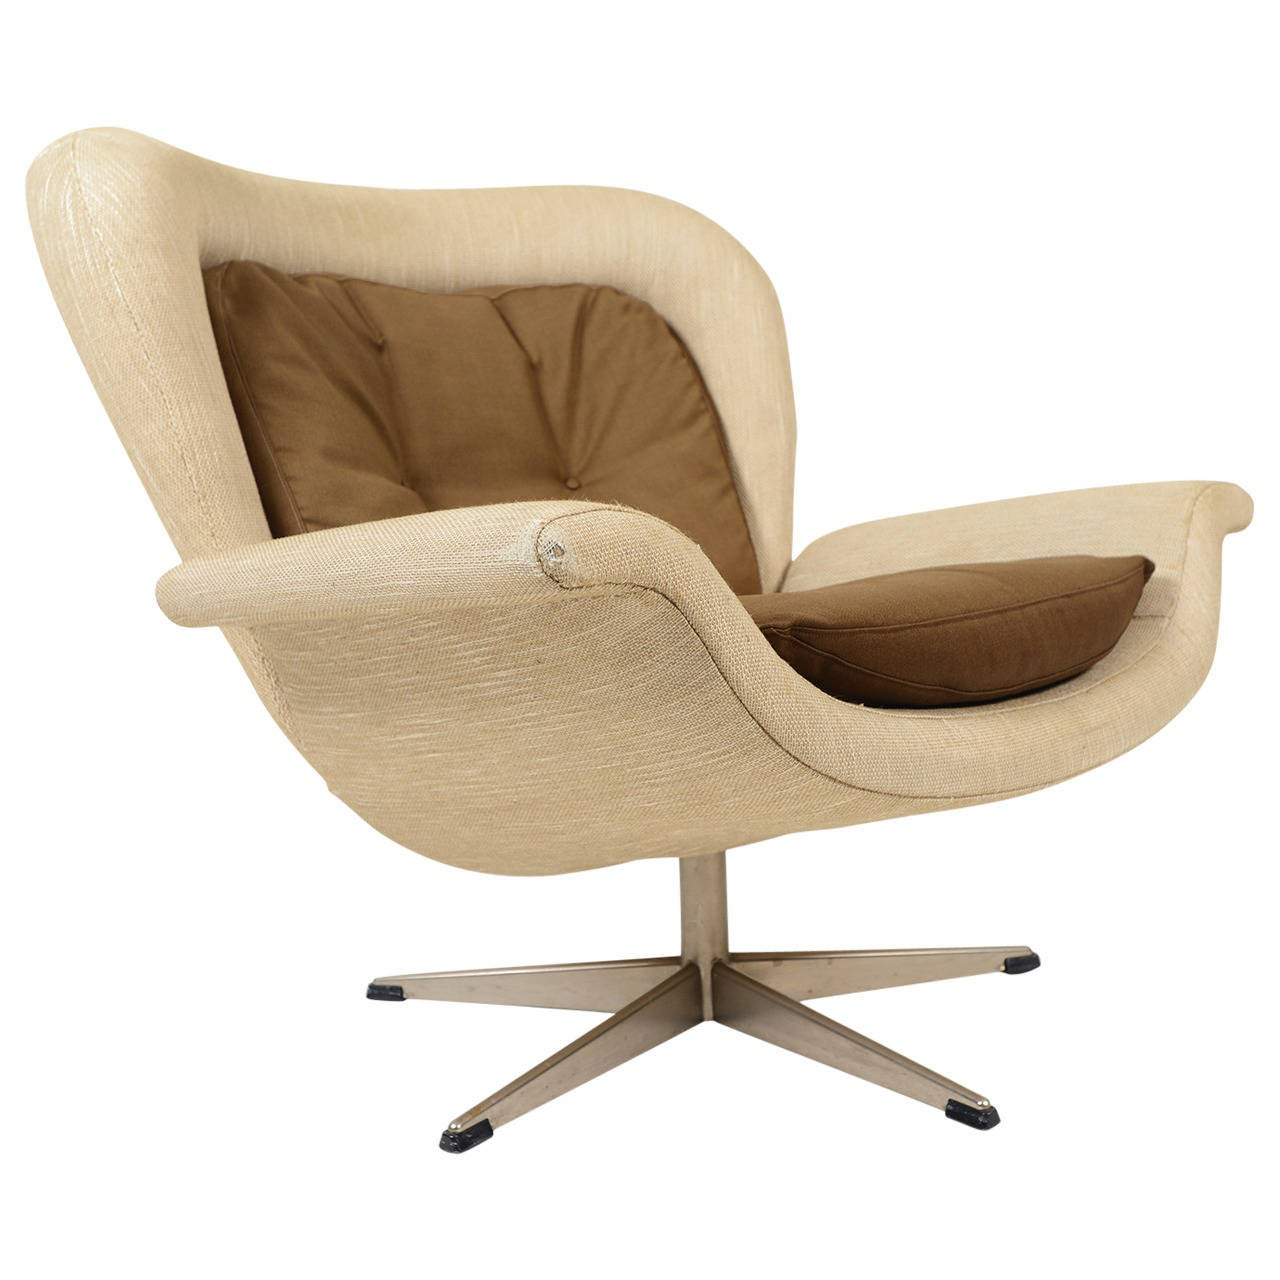 John Mortensen Prototype Swivel Lounge Chair